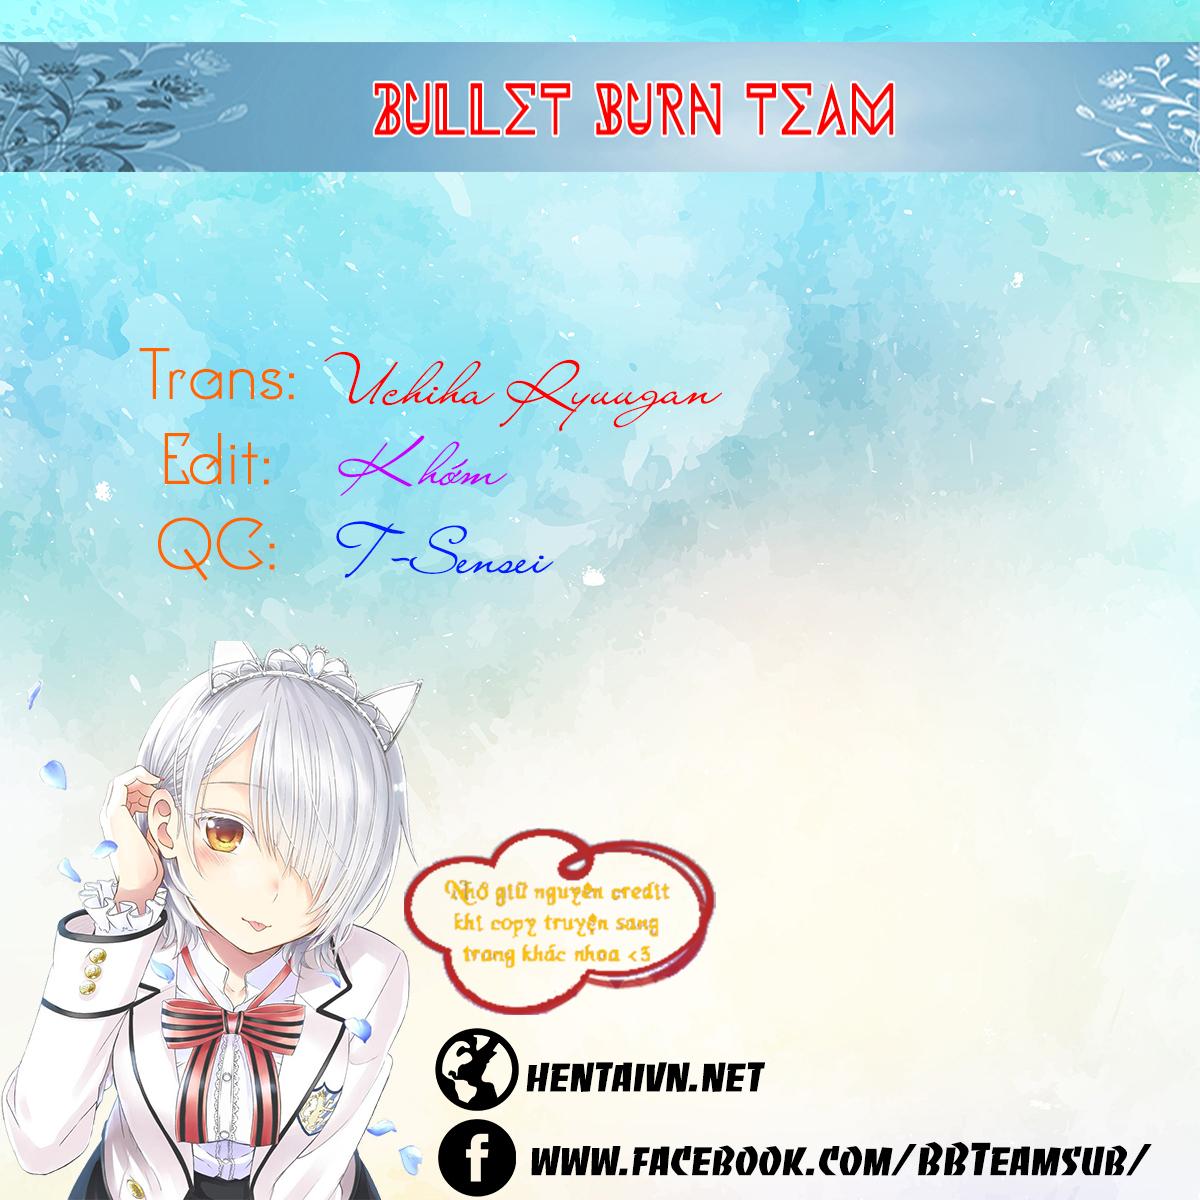 HentaiVN.net - Ảnh 2 - Em yêu thầy 3 - Sensei 3, Sensei Final, Sensei - Oneshot